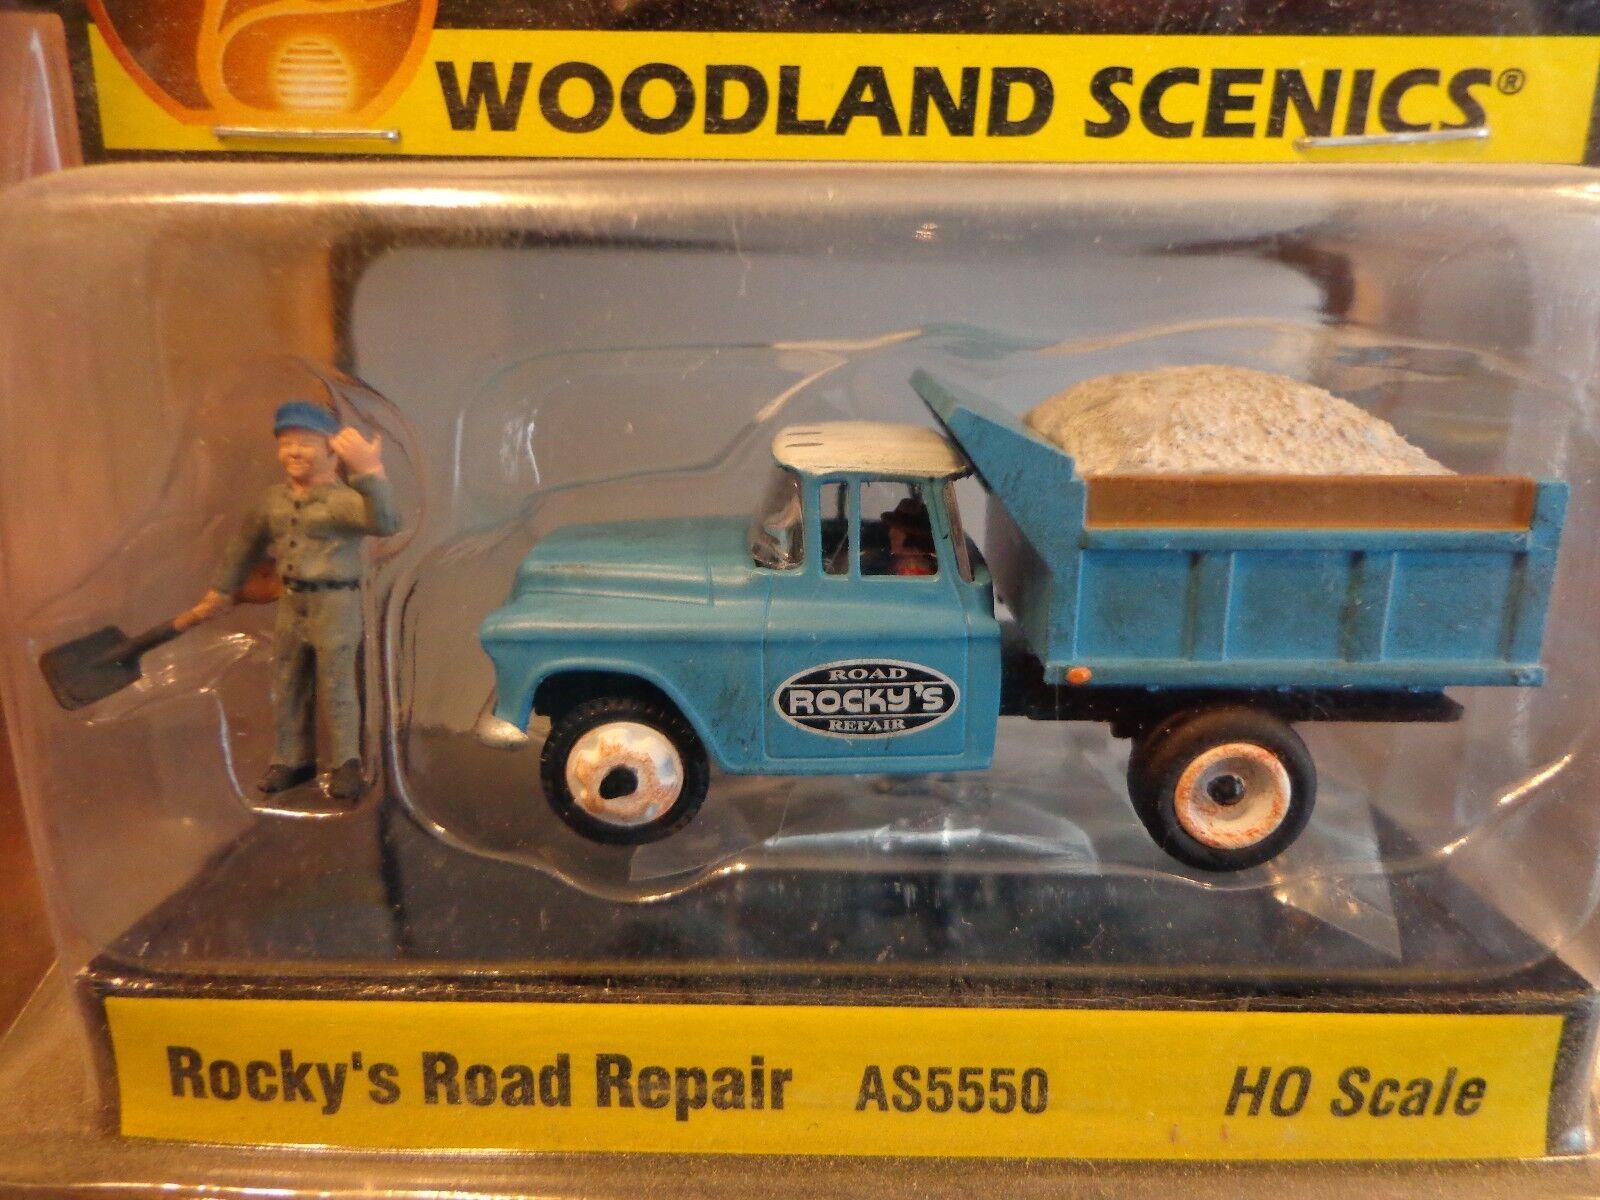 HO Rockys Road Repair Woodland Scenics